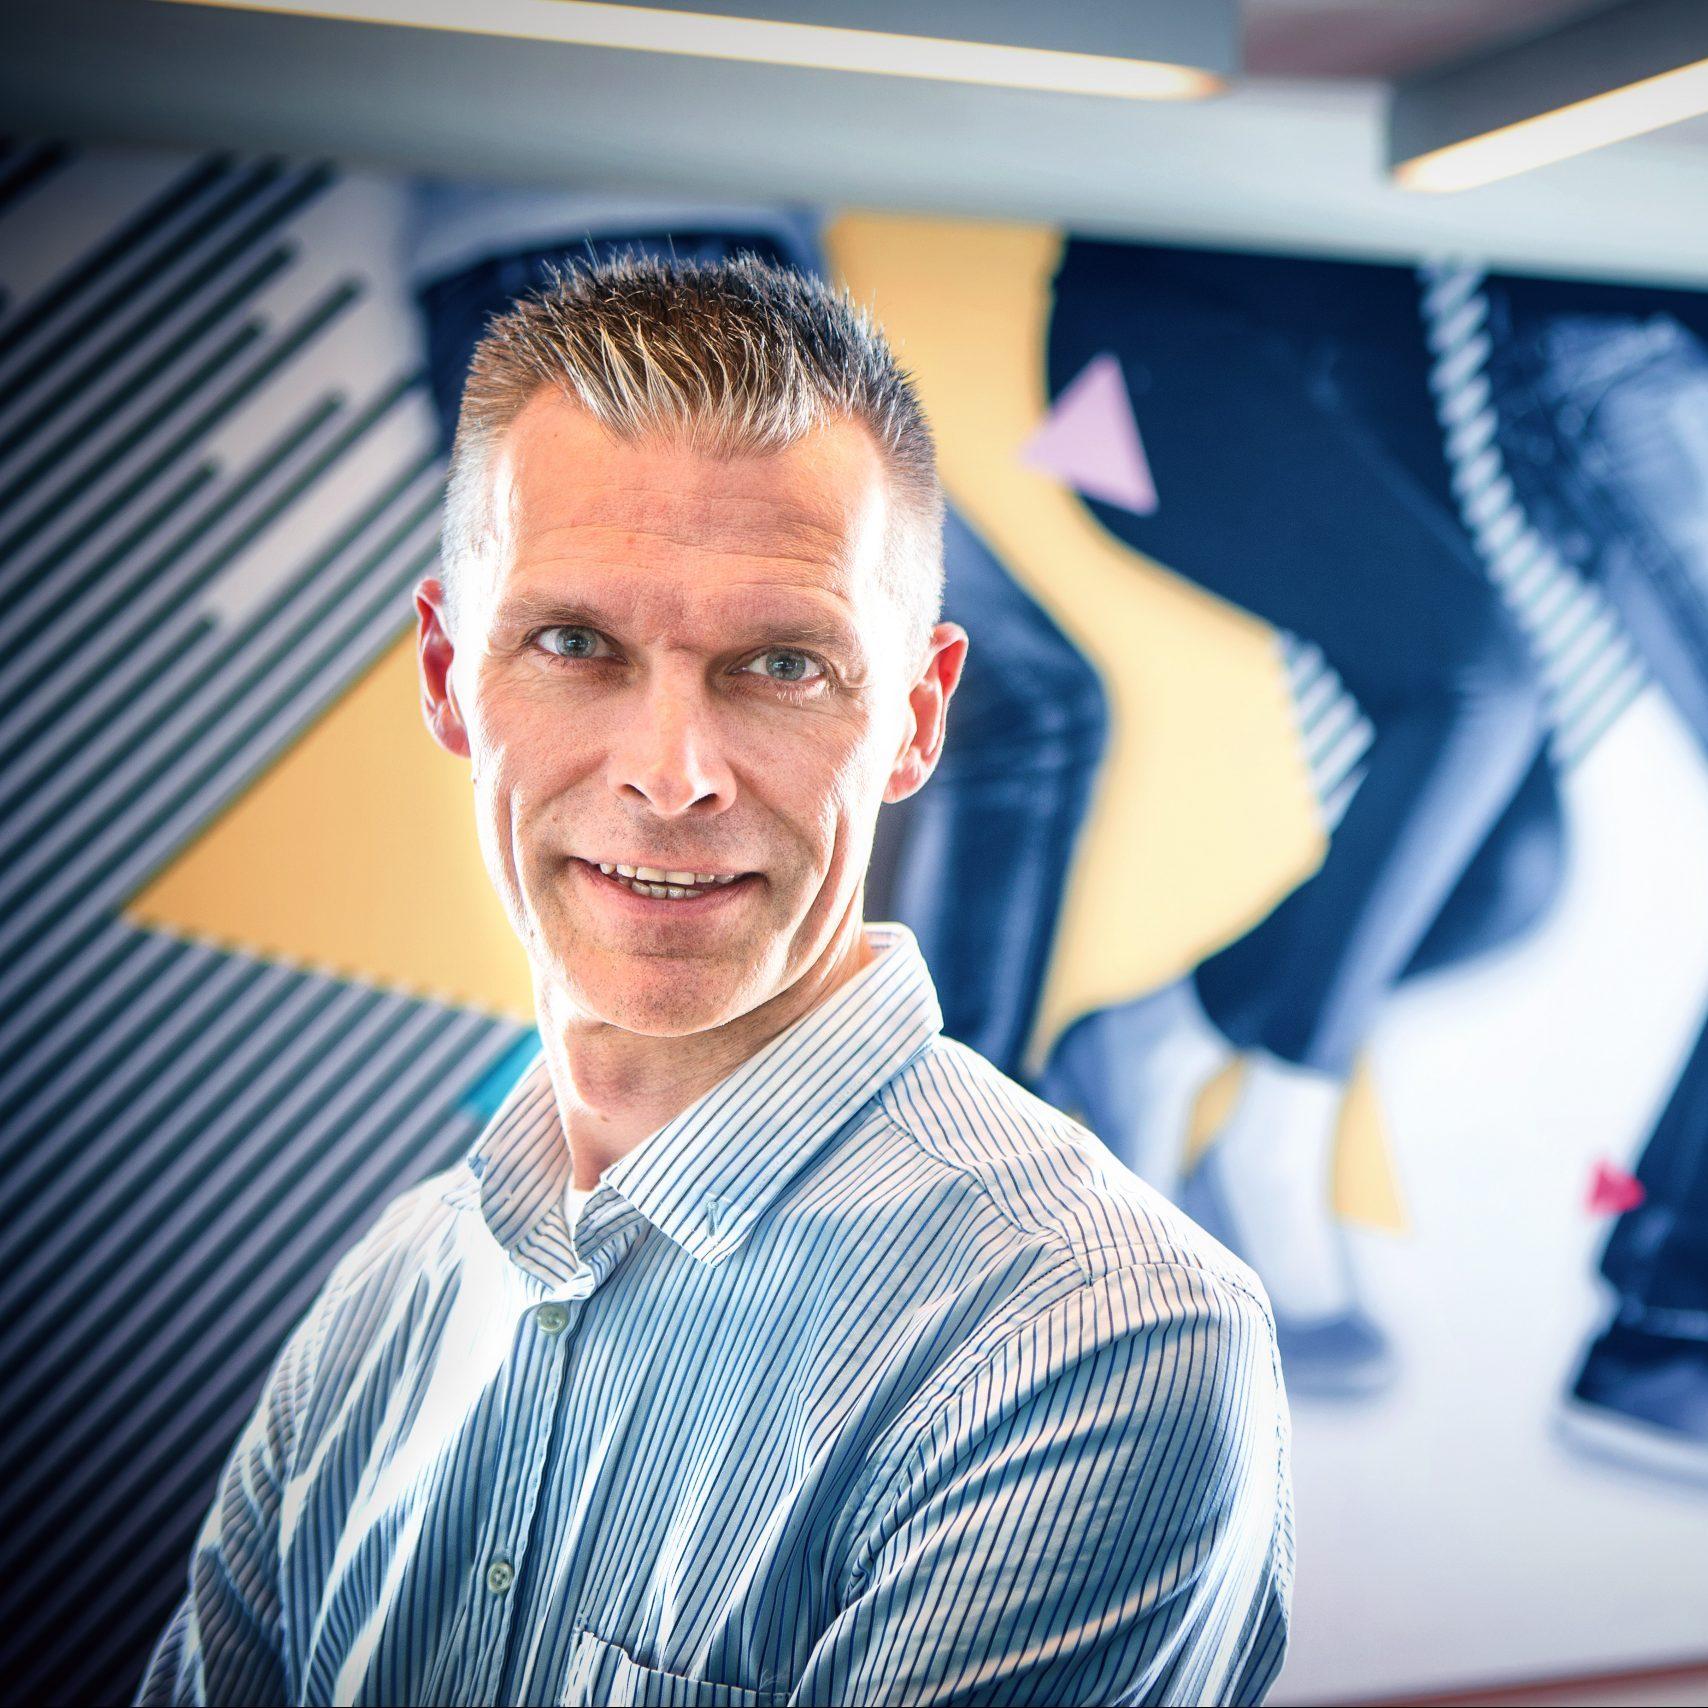 Kristof De Wulf, CEO - InSites Consulting